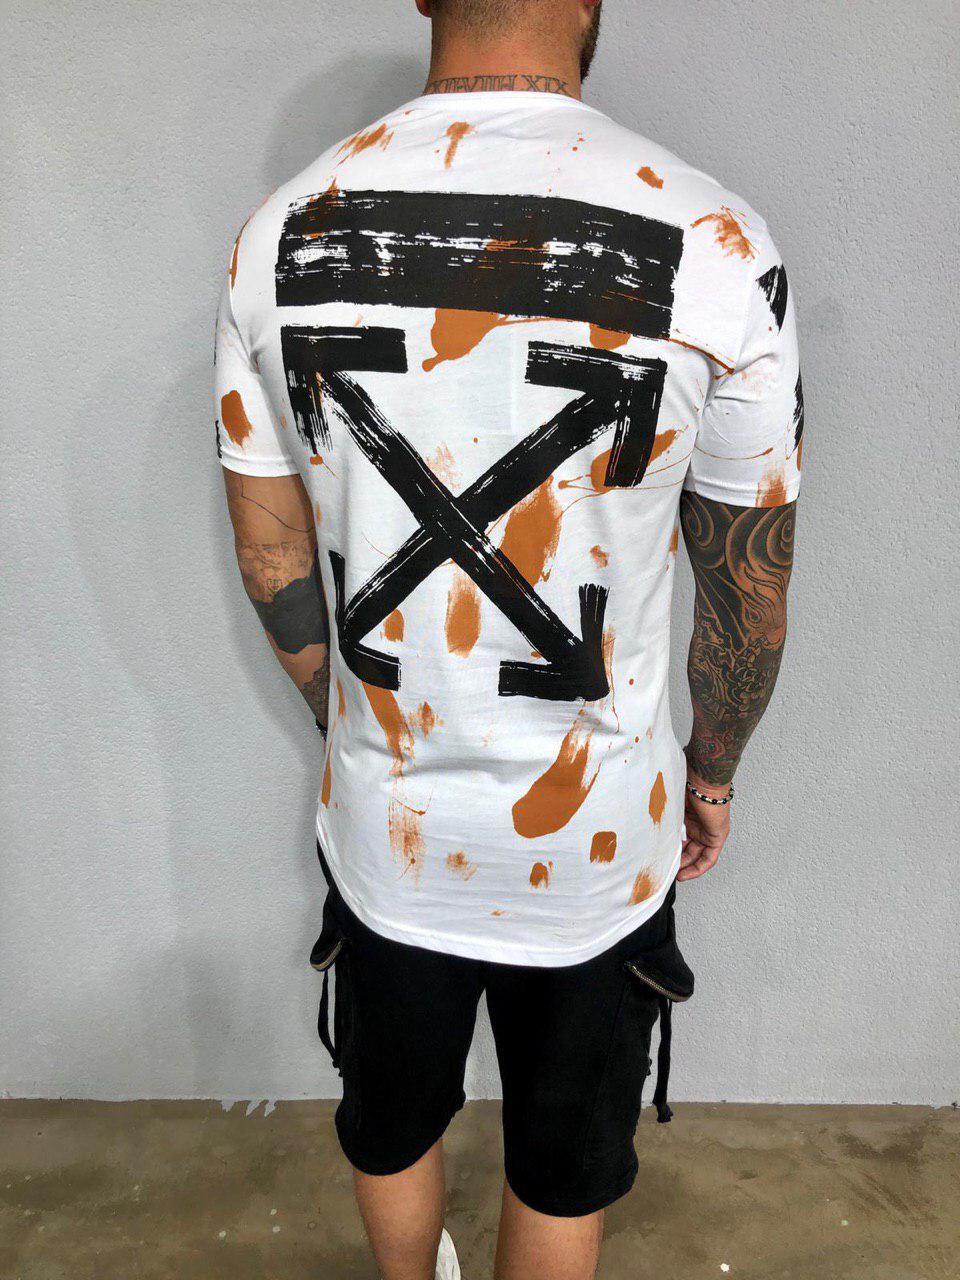 25184a06f028 Мужская футболка Black Island x Off-White ADA1981 White - Компания